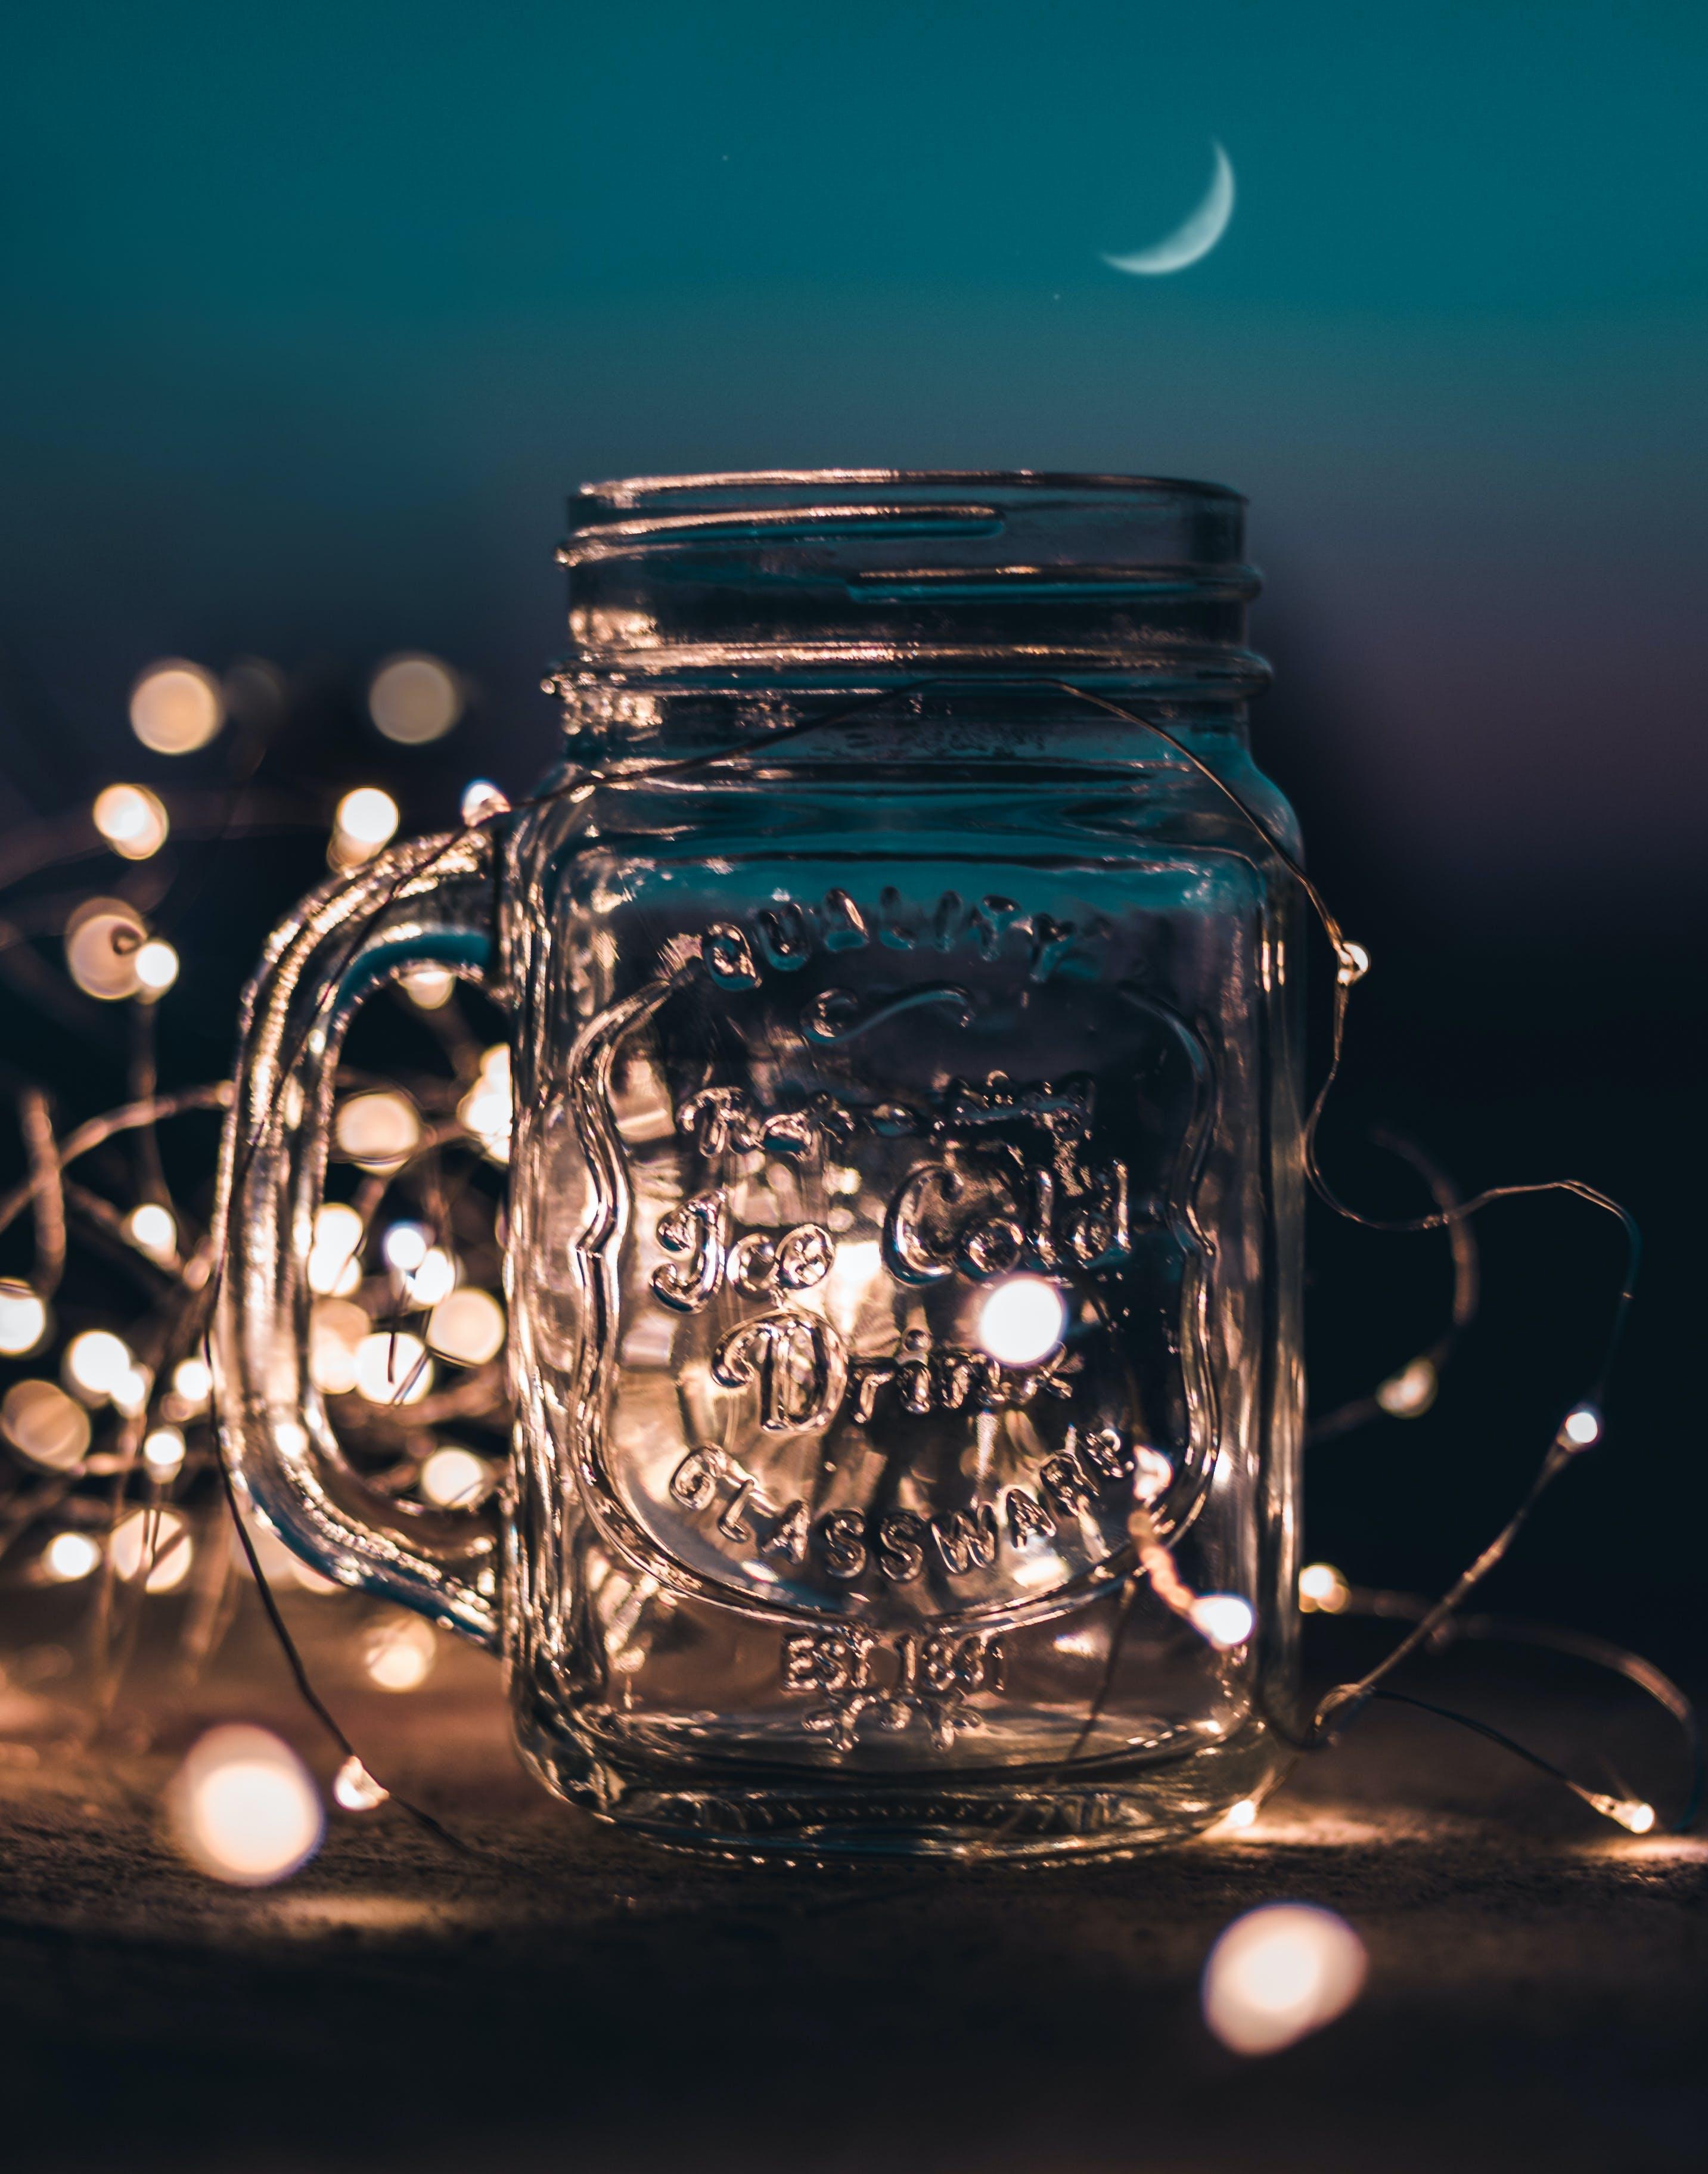 Shallow Focus Photograph of Clear Glass Mason Jar With Fairy Lights